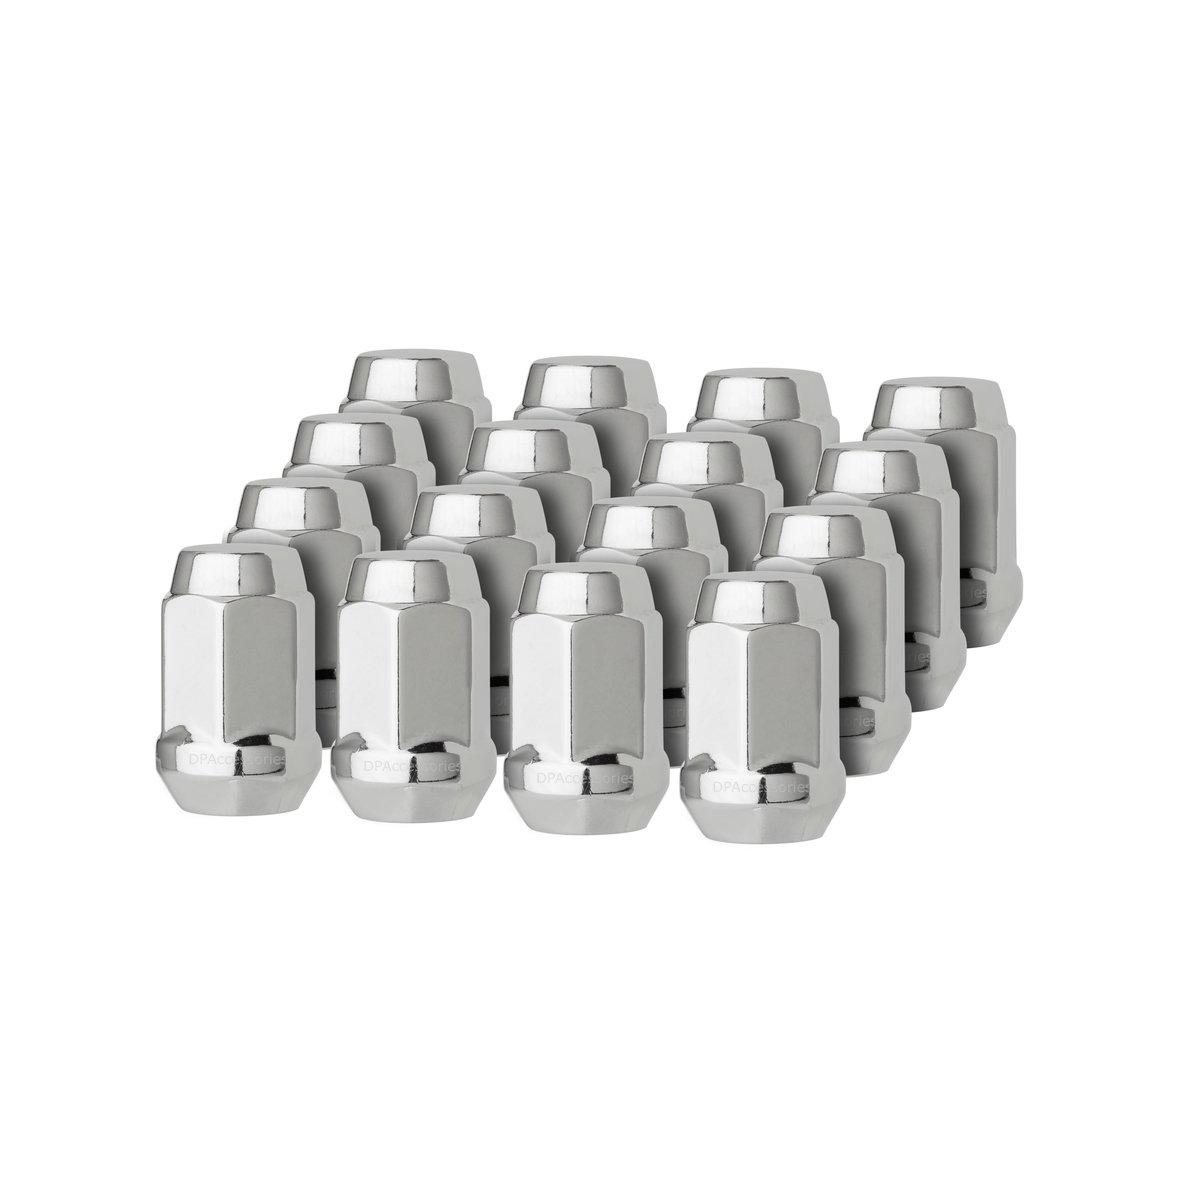 DPAccessories LCB3B6HC-CH04016 16 Chrome 12x1.5 Closed End Bulge Acorn Lug Nuts - Cone Seat - 19mm Hex Wheel Lug Nut